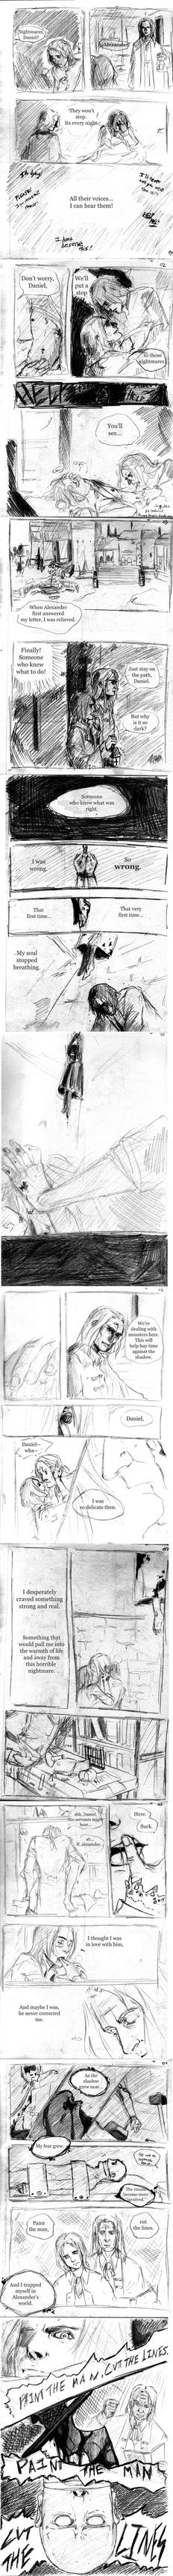 Amnesia Comic Part One by peppermintjam